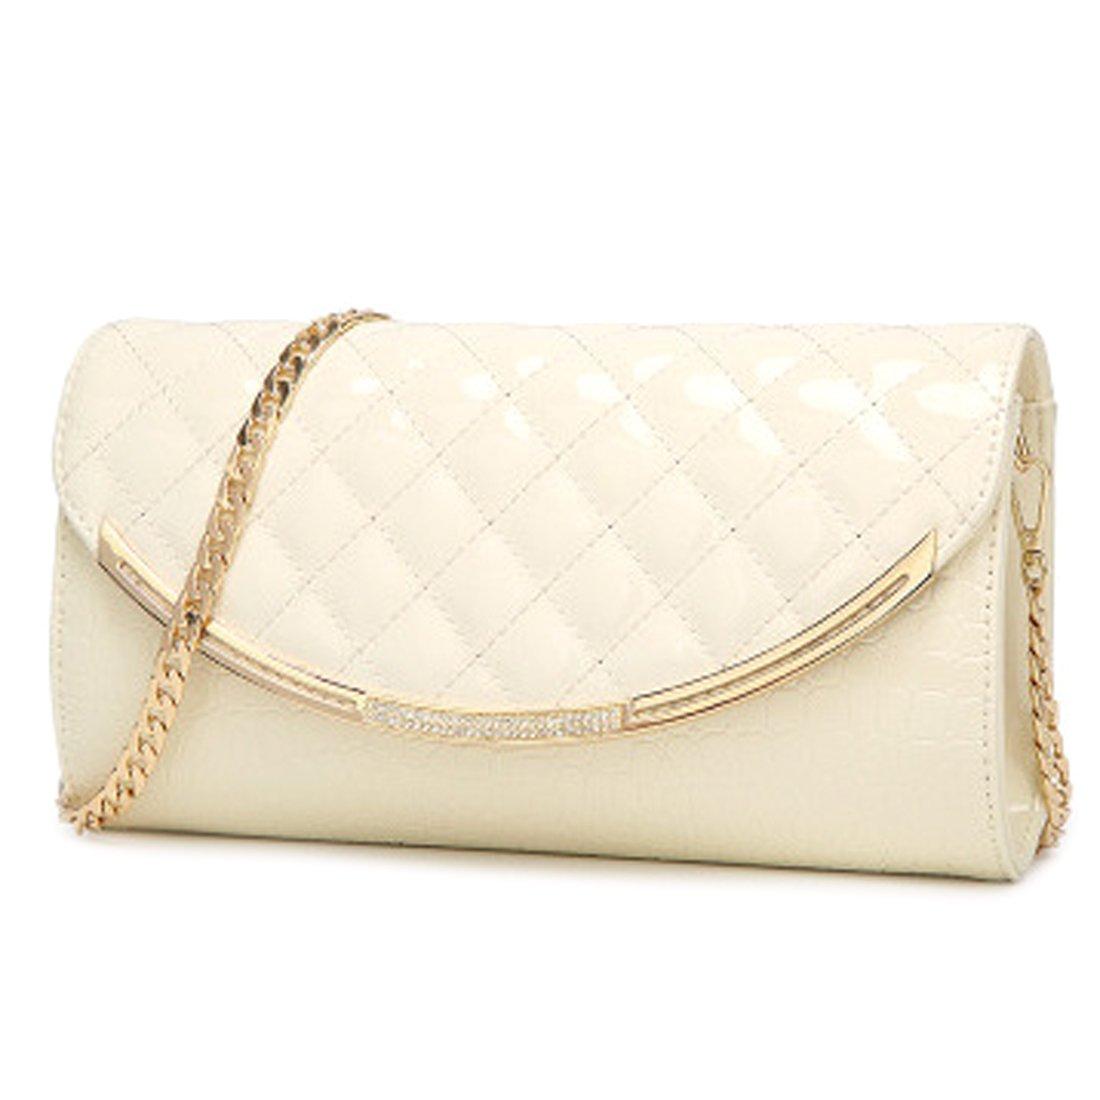 Women Fashion Leather Clutch Bag Evening Handbag Crossbody Purse (Off white)